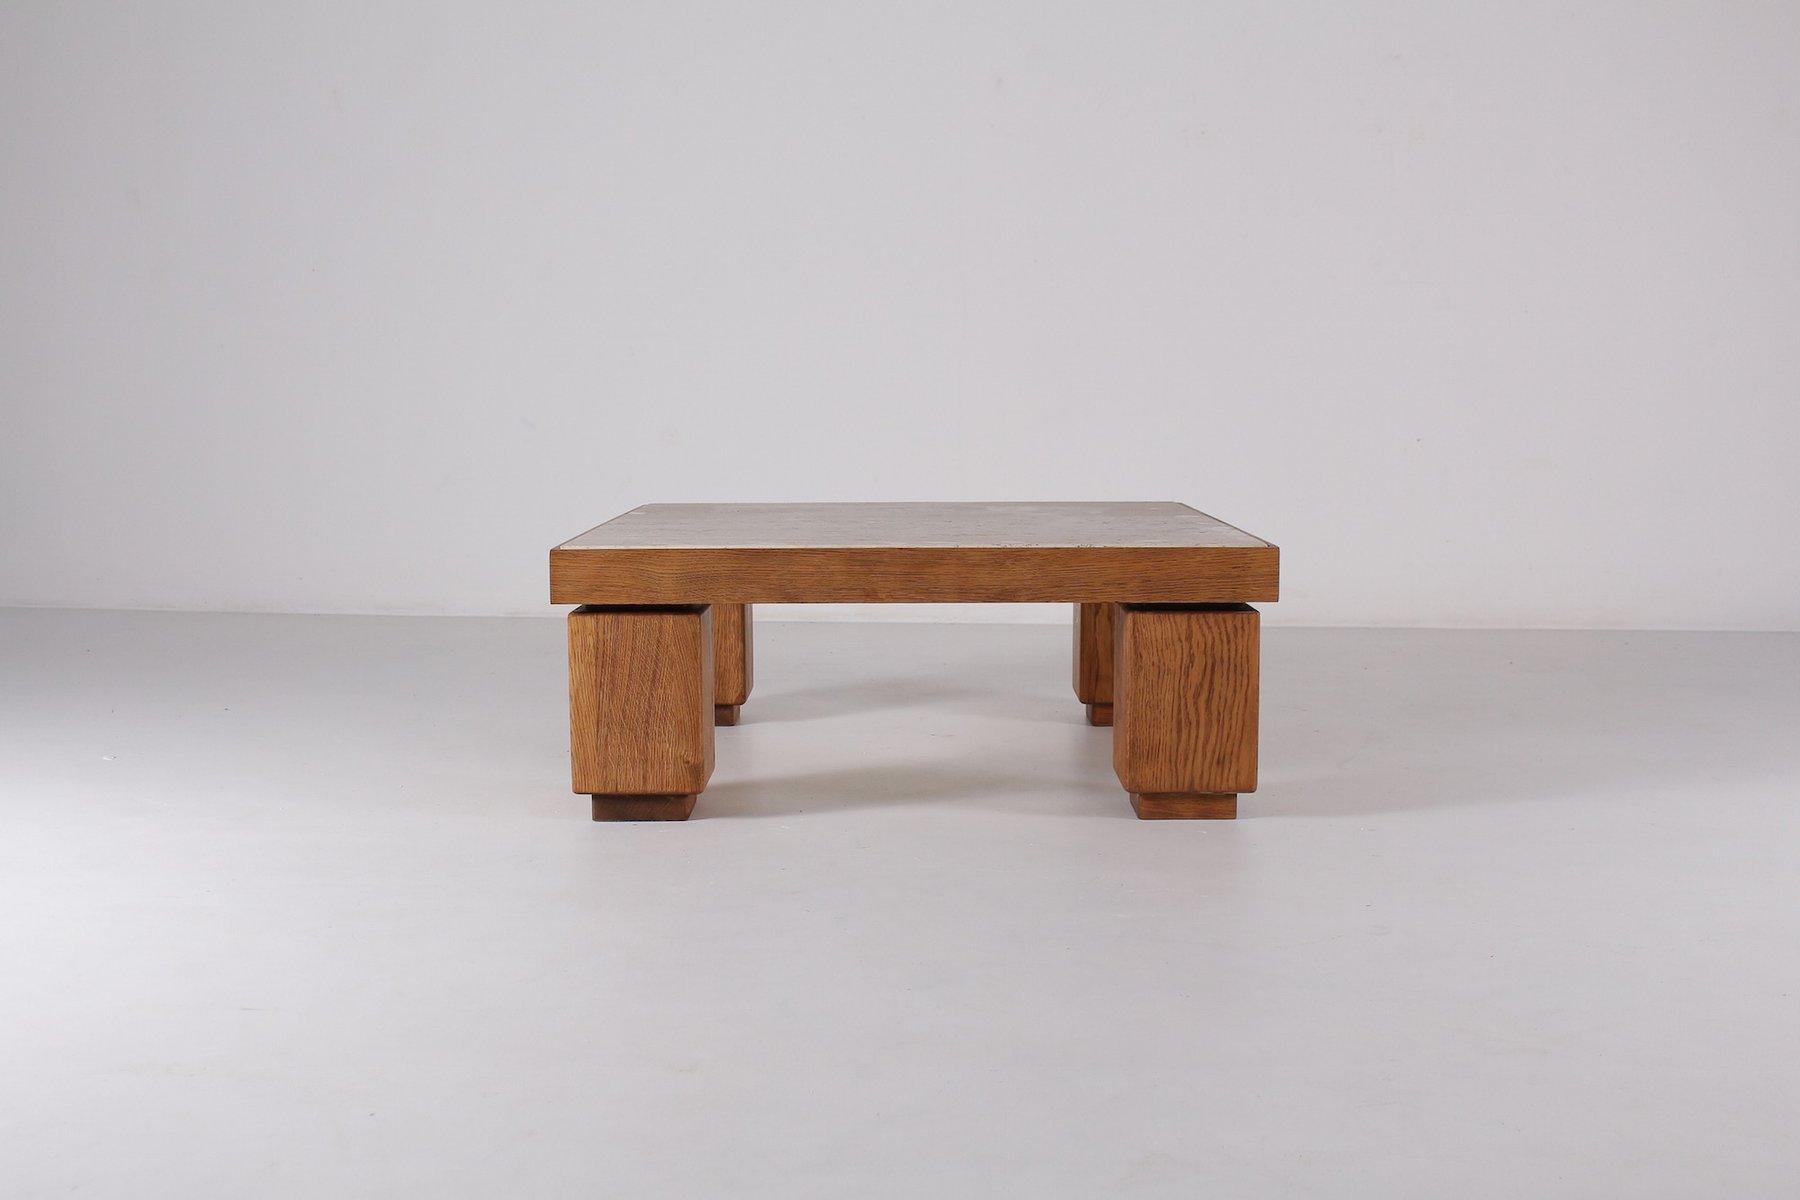 Table Basse Vintage en Chêne Clair avec Dalle de Travertin en vente ...